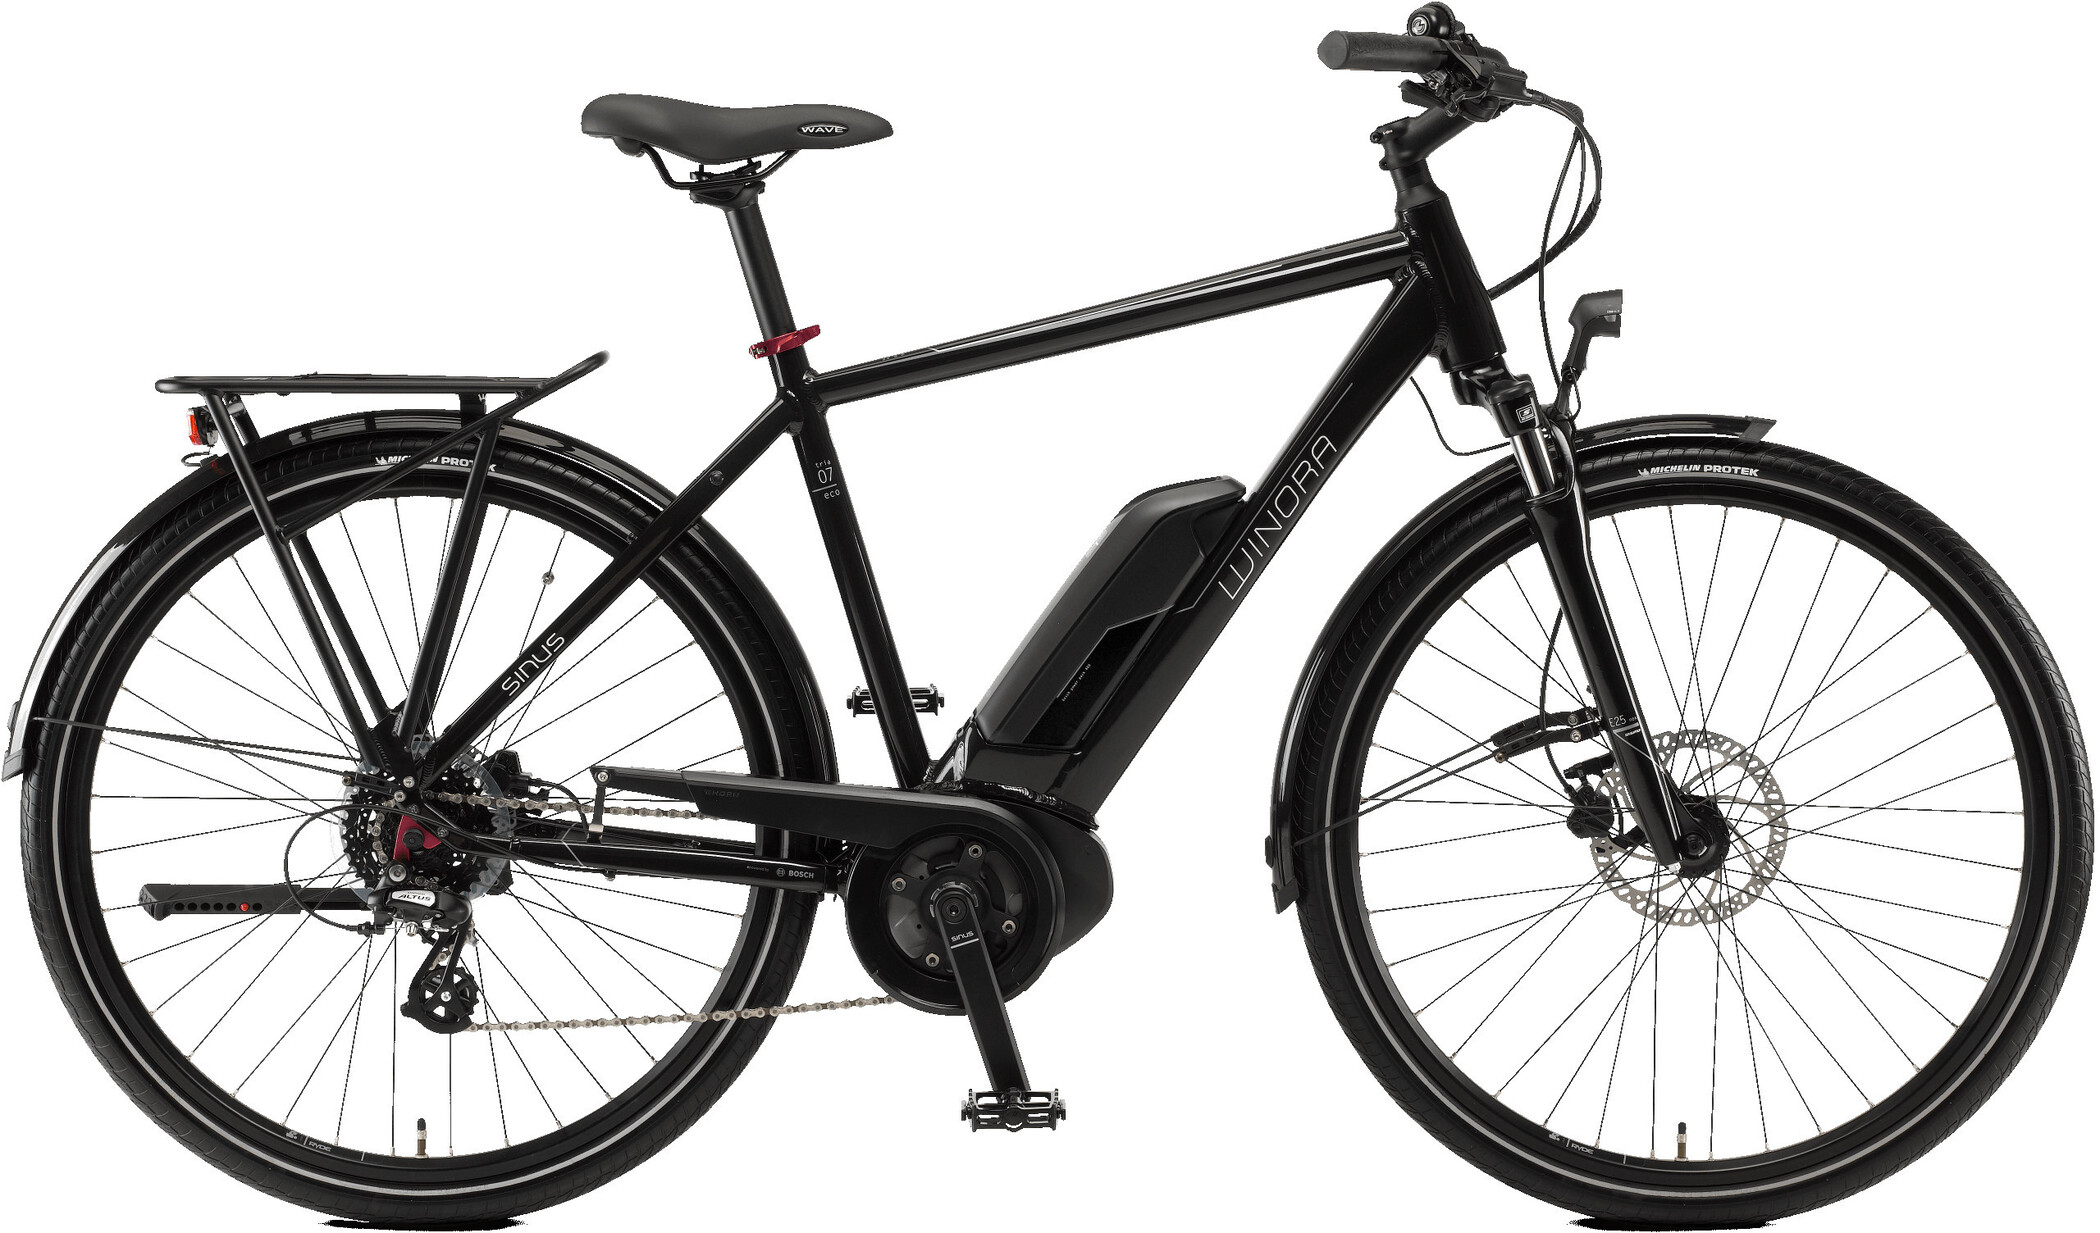 Winora Sinus Tria 7eco Herrer, black (2020)   City-cykler